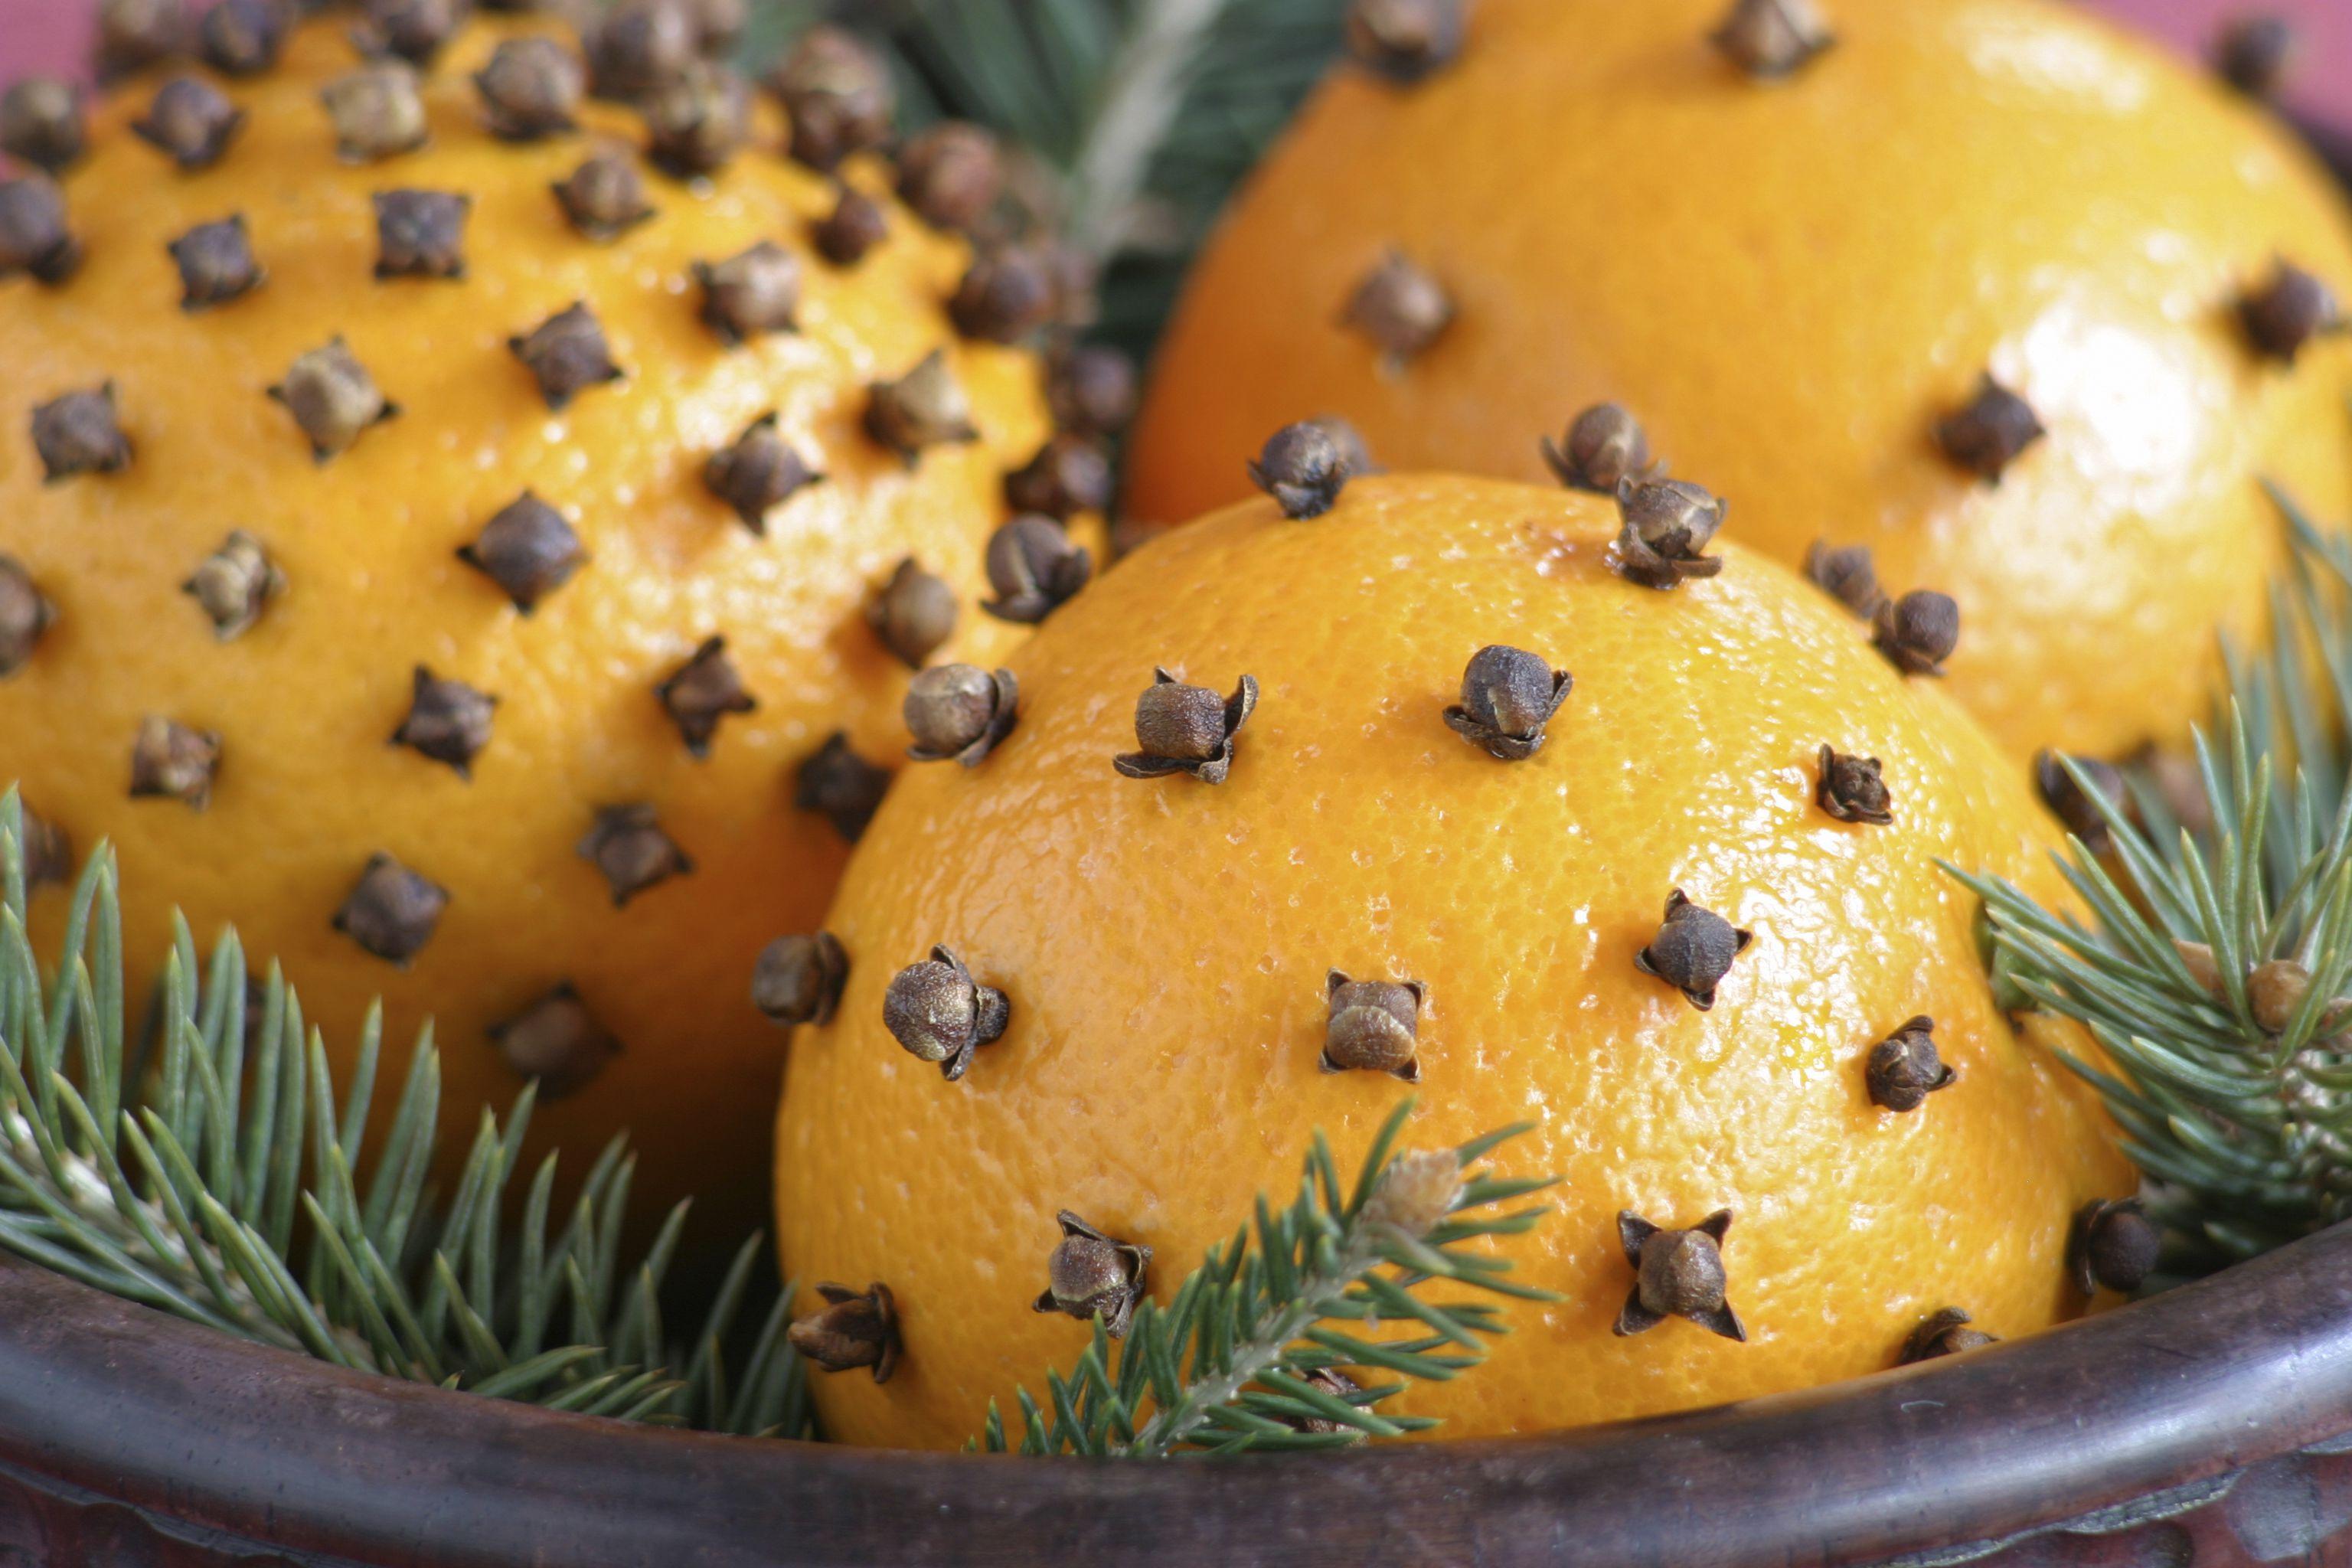 10 aromatizantes naturales para hacer en casa - Aromatizantes naturales para la casa ...